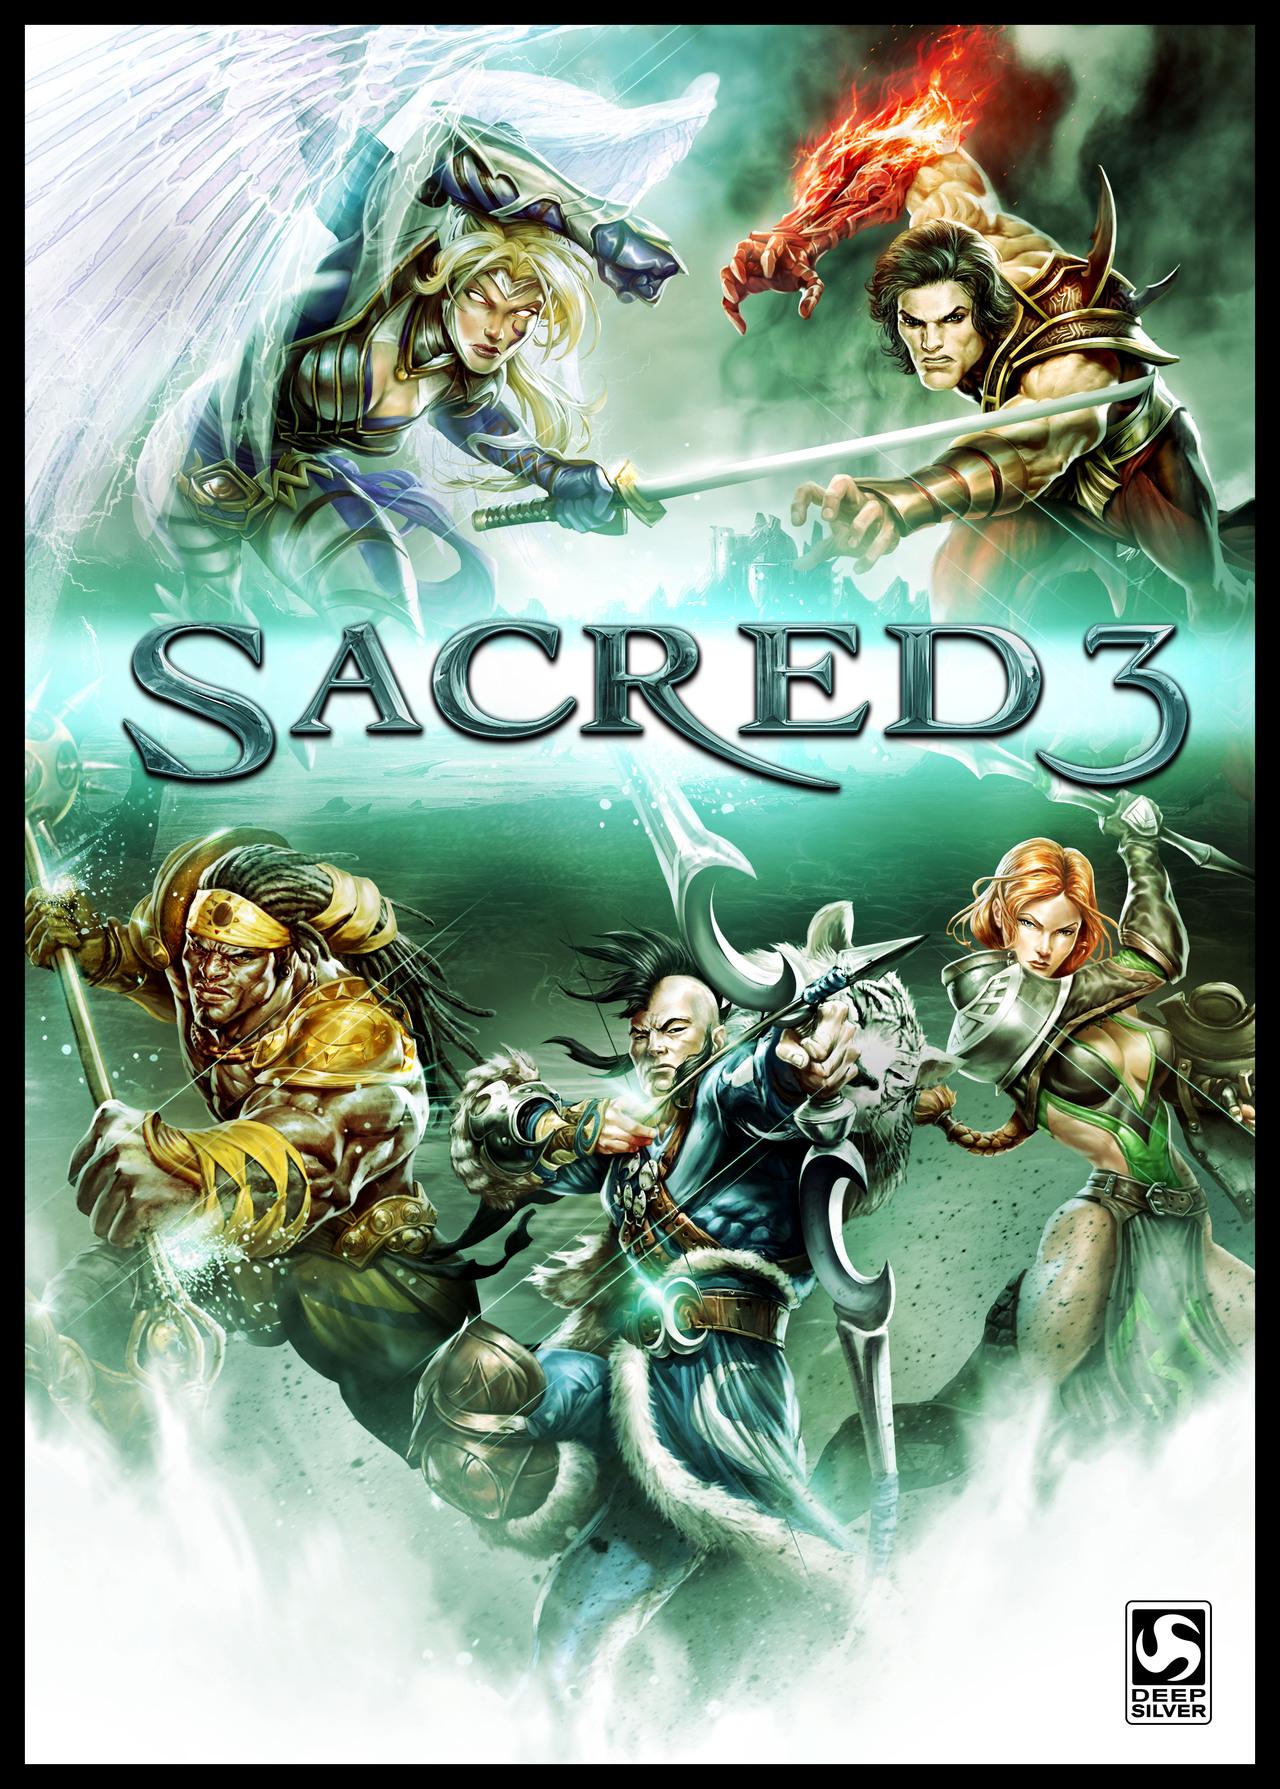 sacred-3-pc-1392840606-014